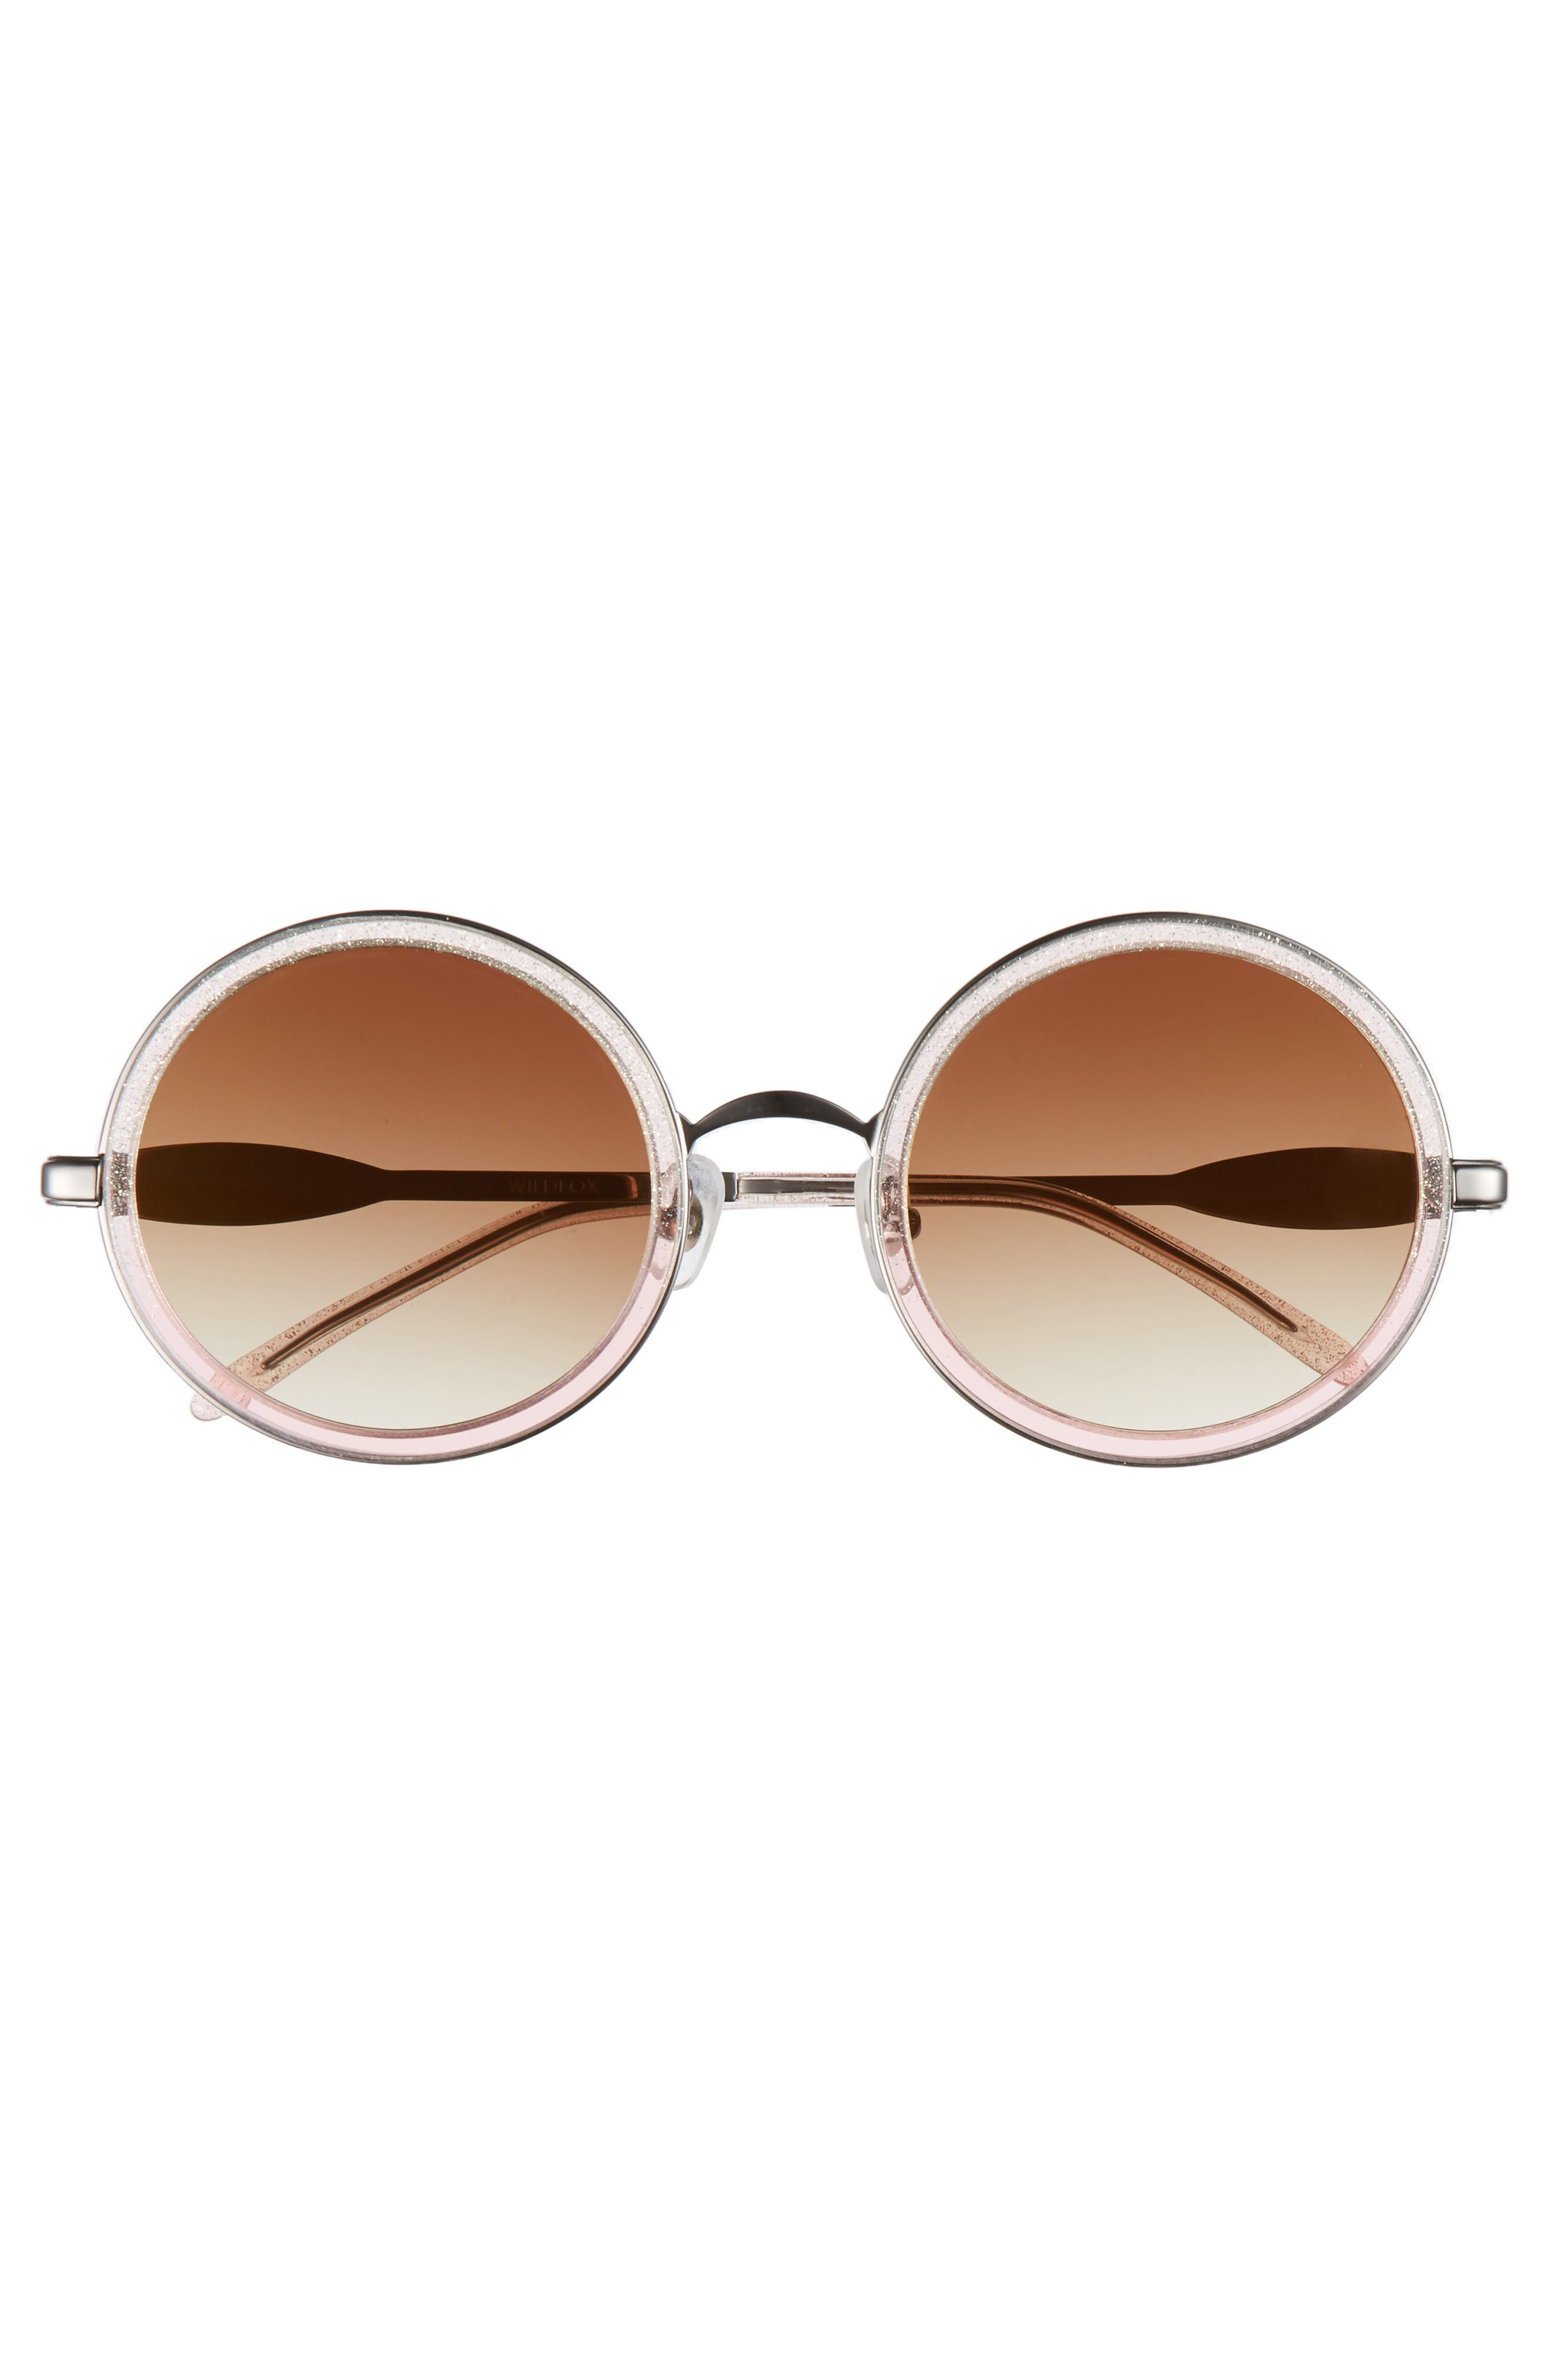 Ryder Zero 49mm Flat Round Sunglasses,                             Alternate thumbnail 3, color,                             GLITZ